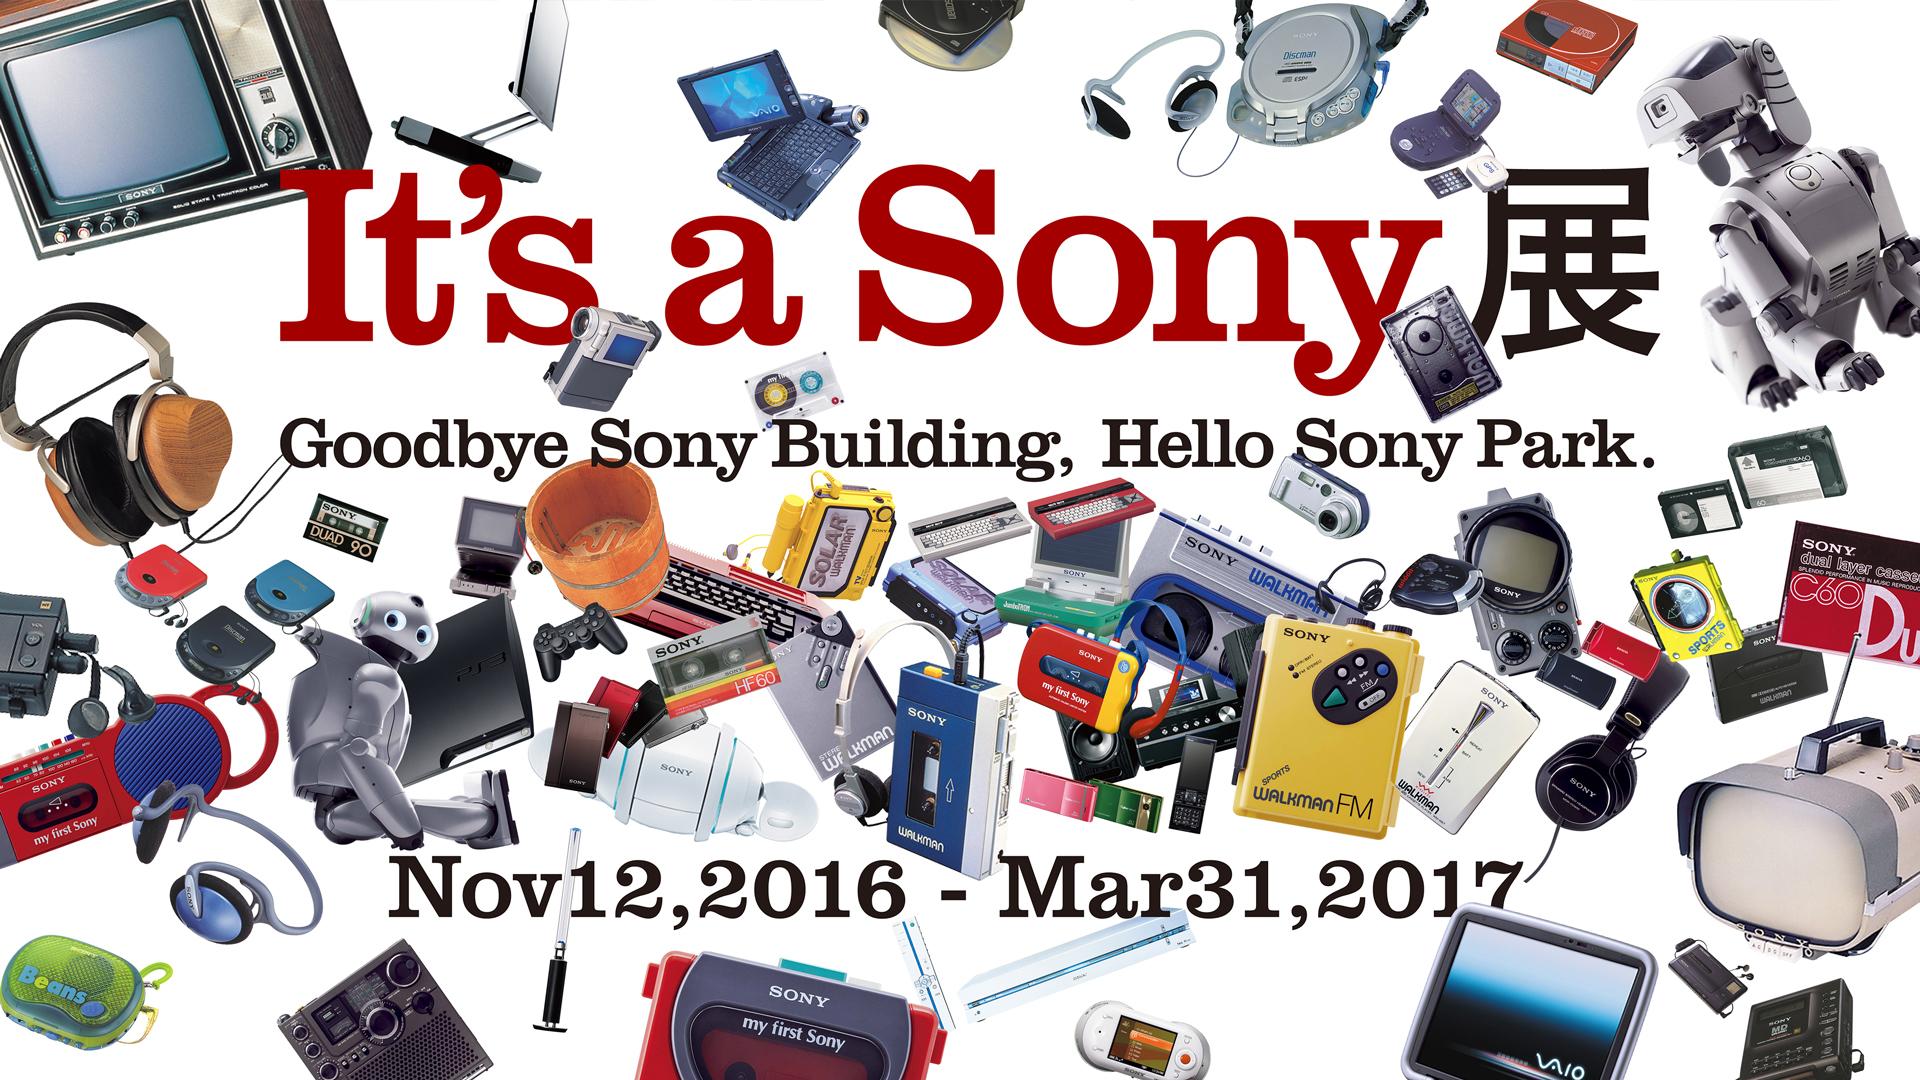 it s a sony展 が開催に 歴代のソニー商品とともにソニービル50年の歴史